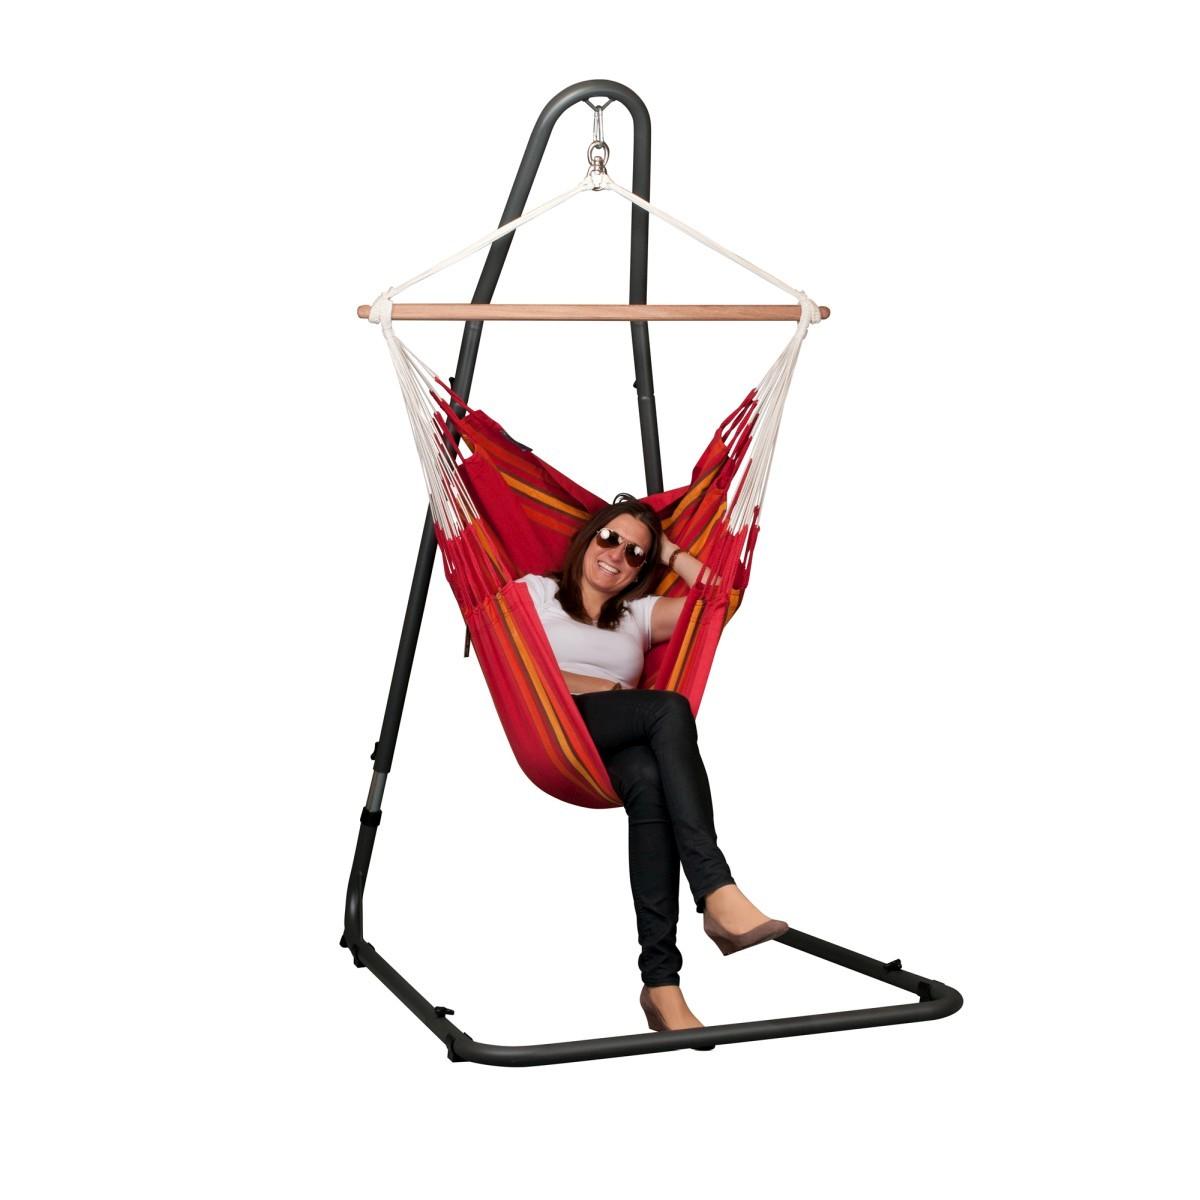 la siesta chaise hamac basic currambera cherry support pour. Black Bedroom Furniture Sets. Home Design Ideas